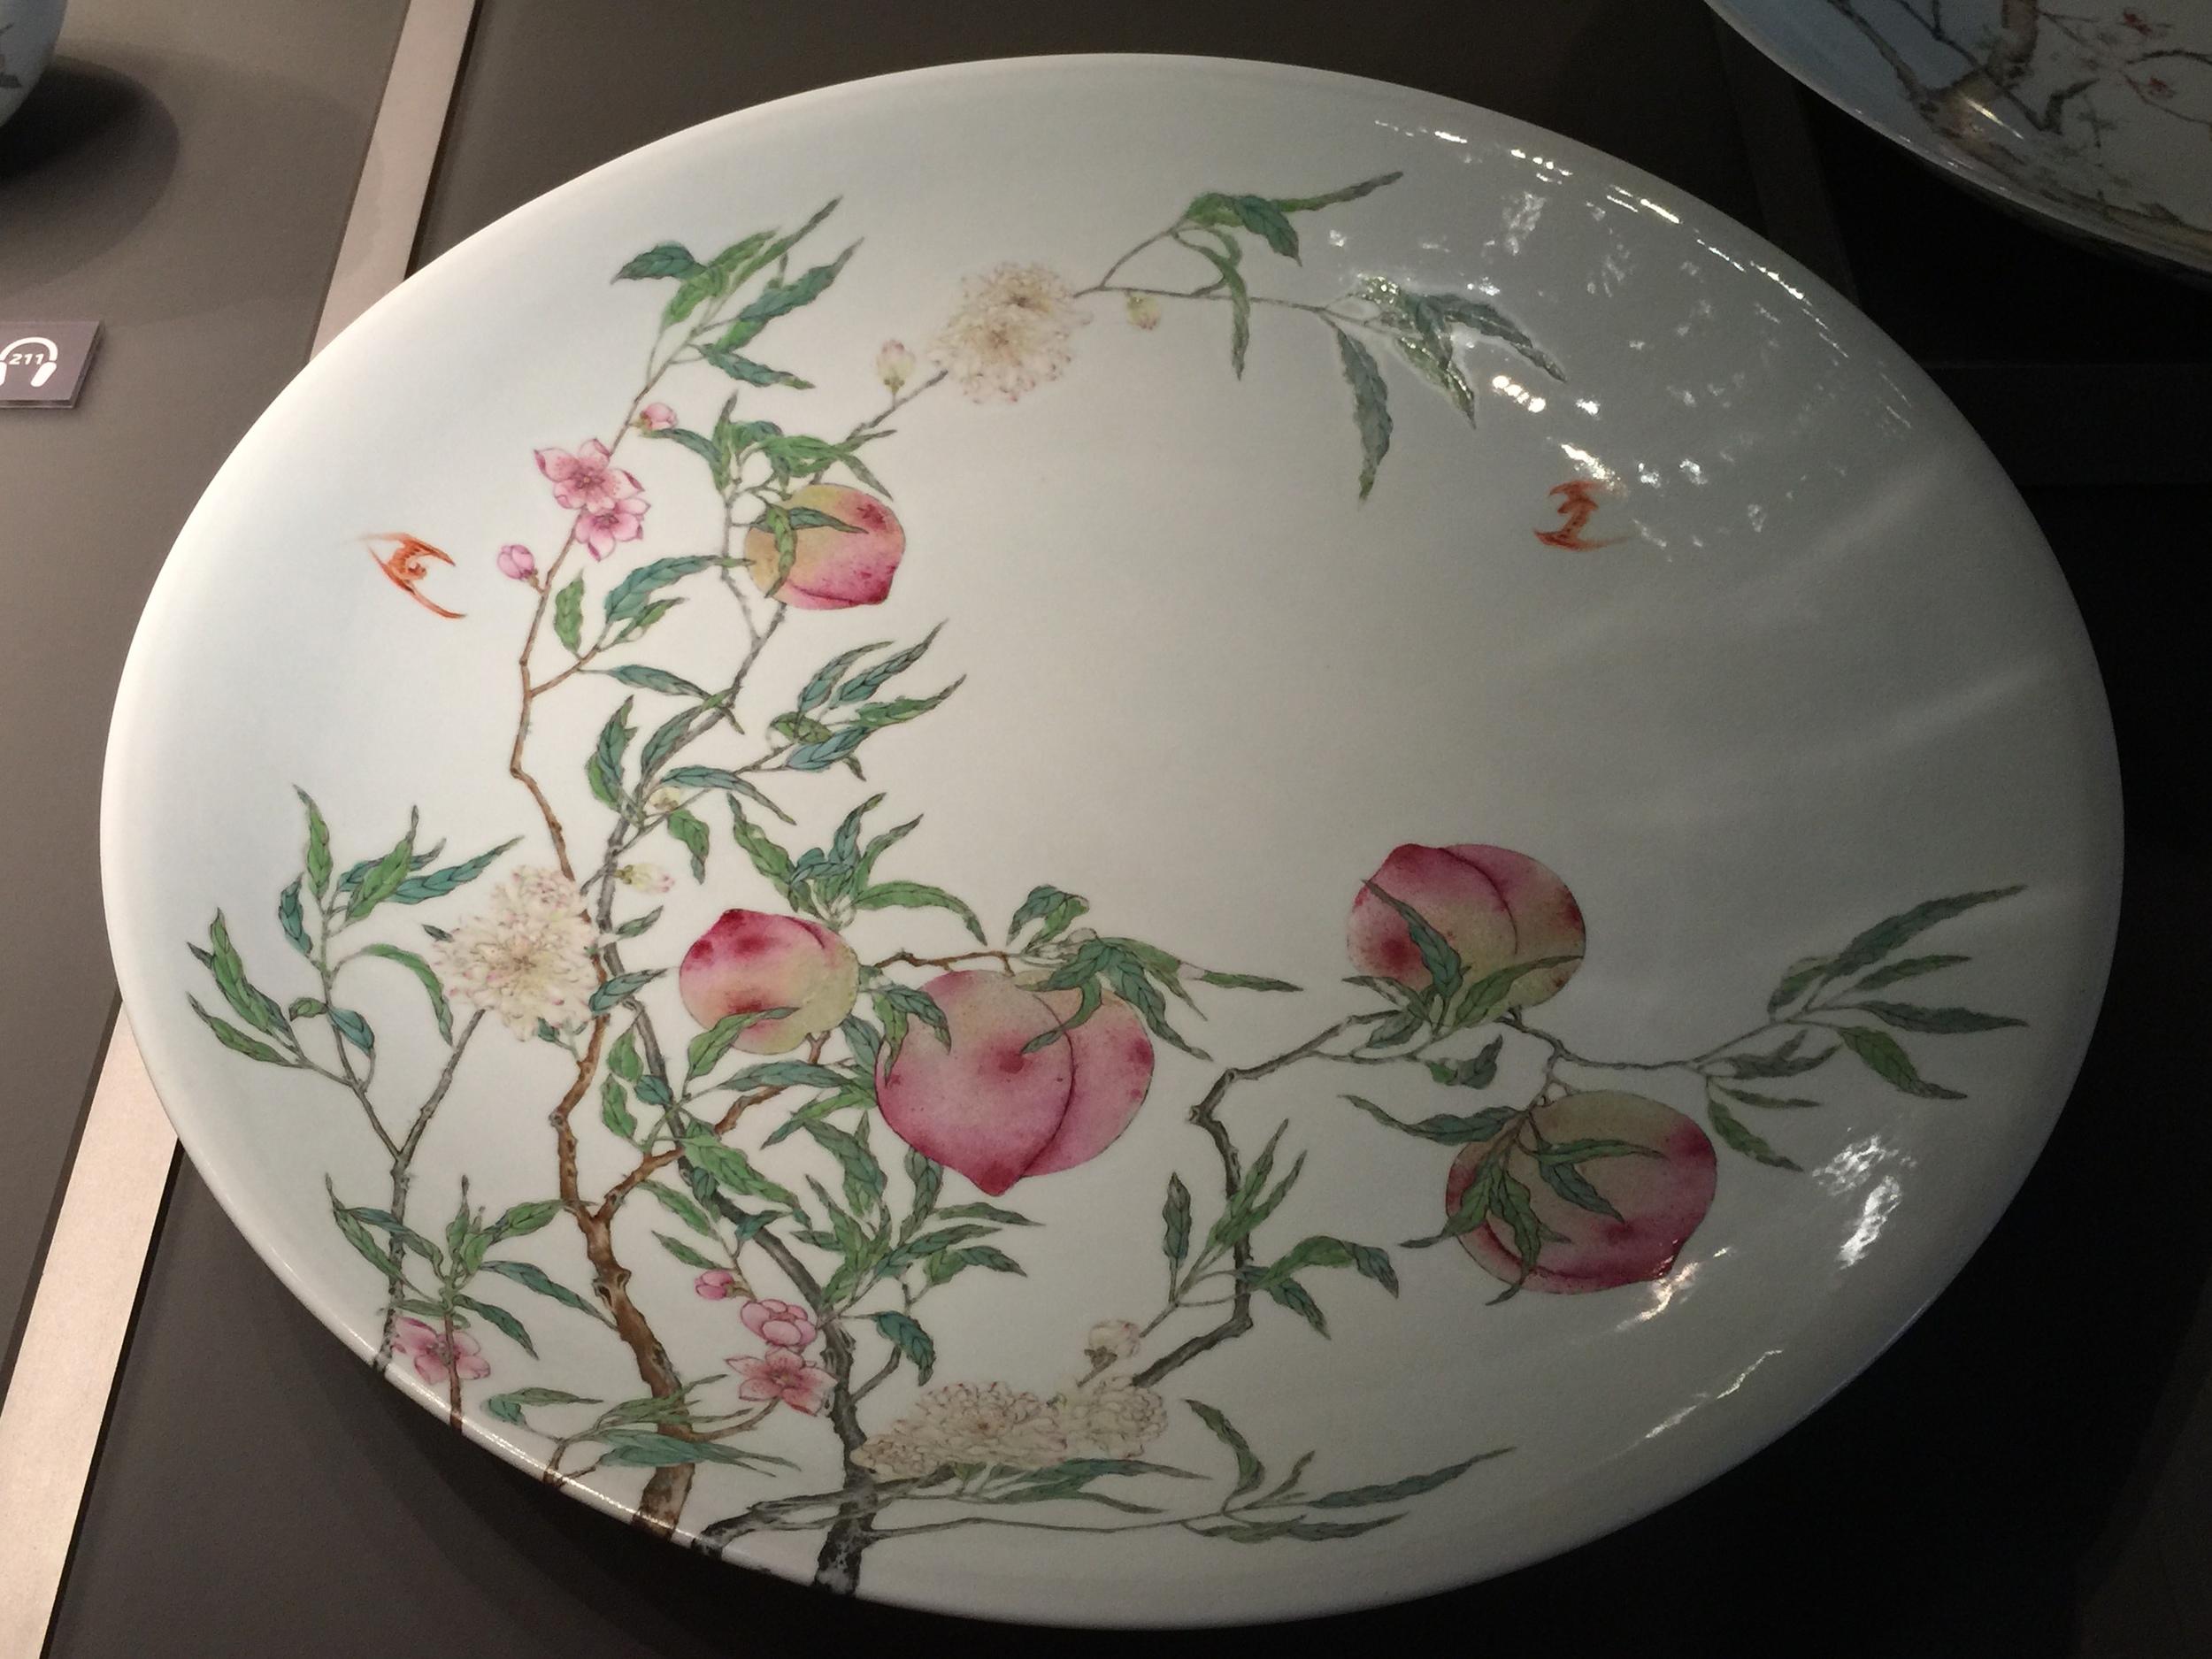 Chinese-Porcelain-British-Museum-Percival-David-jessewaugh.com-75.jpg